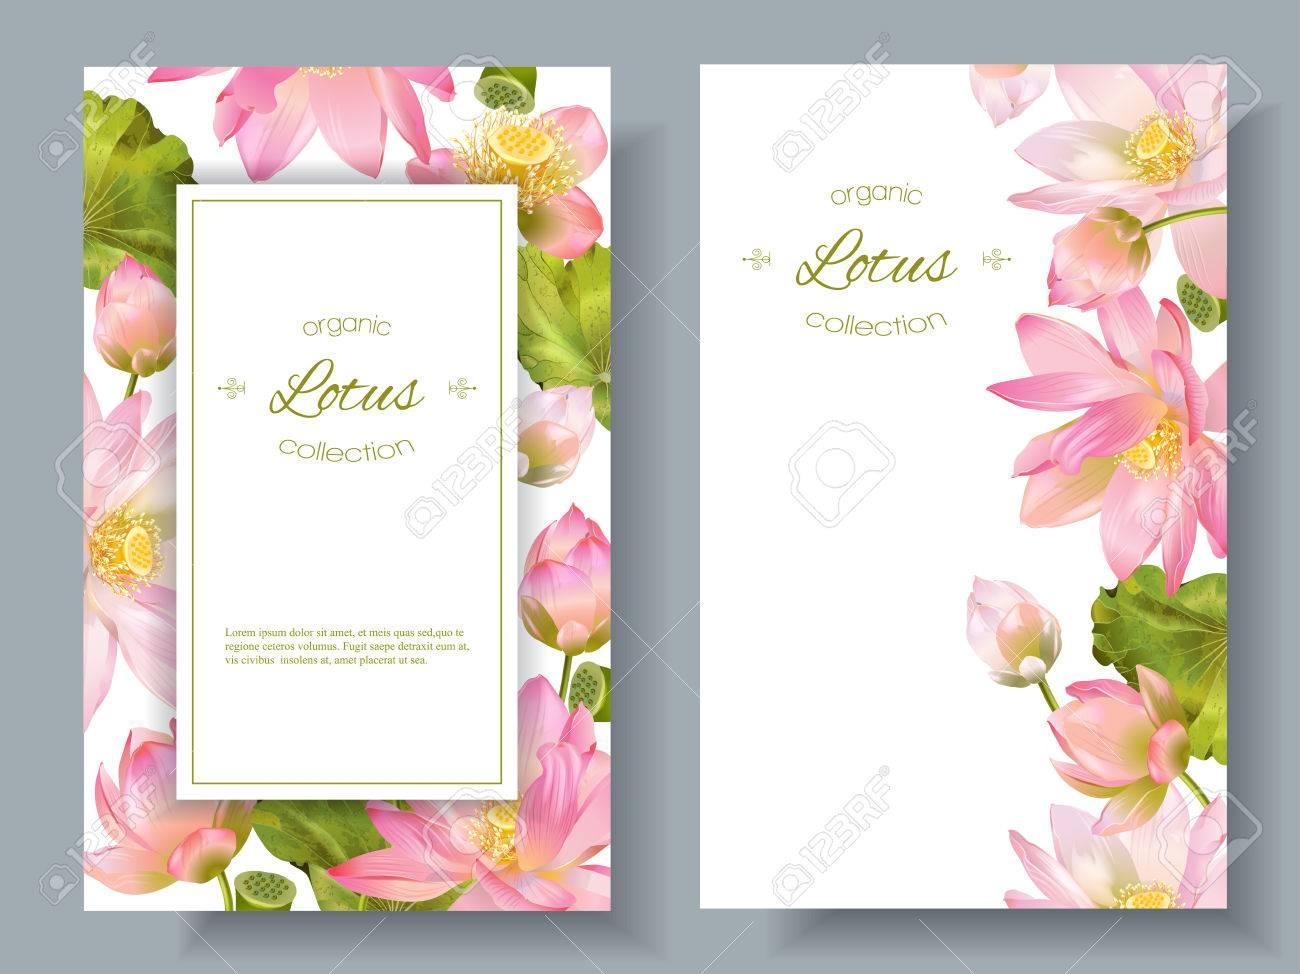 Lotus flower banners - 71027672